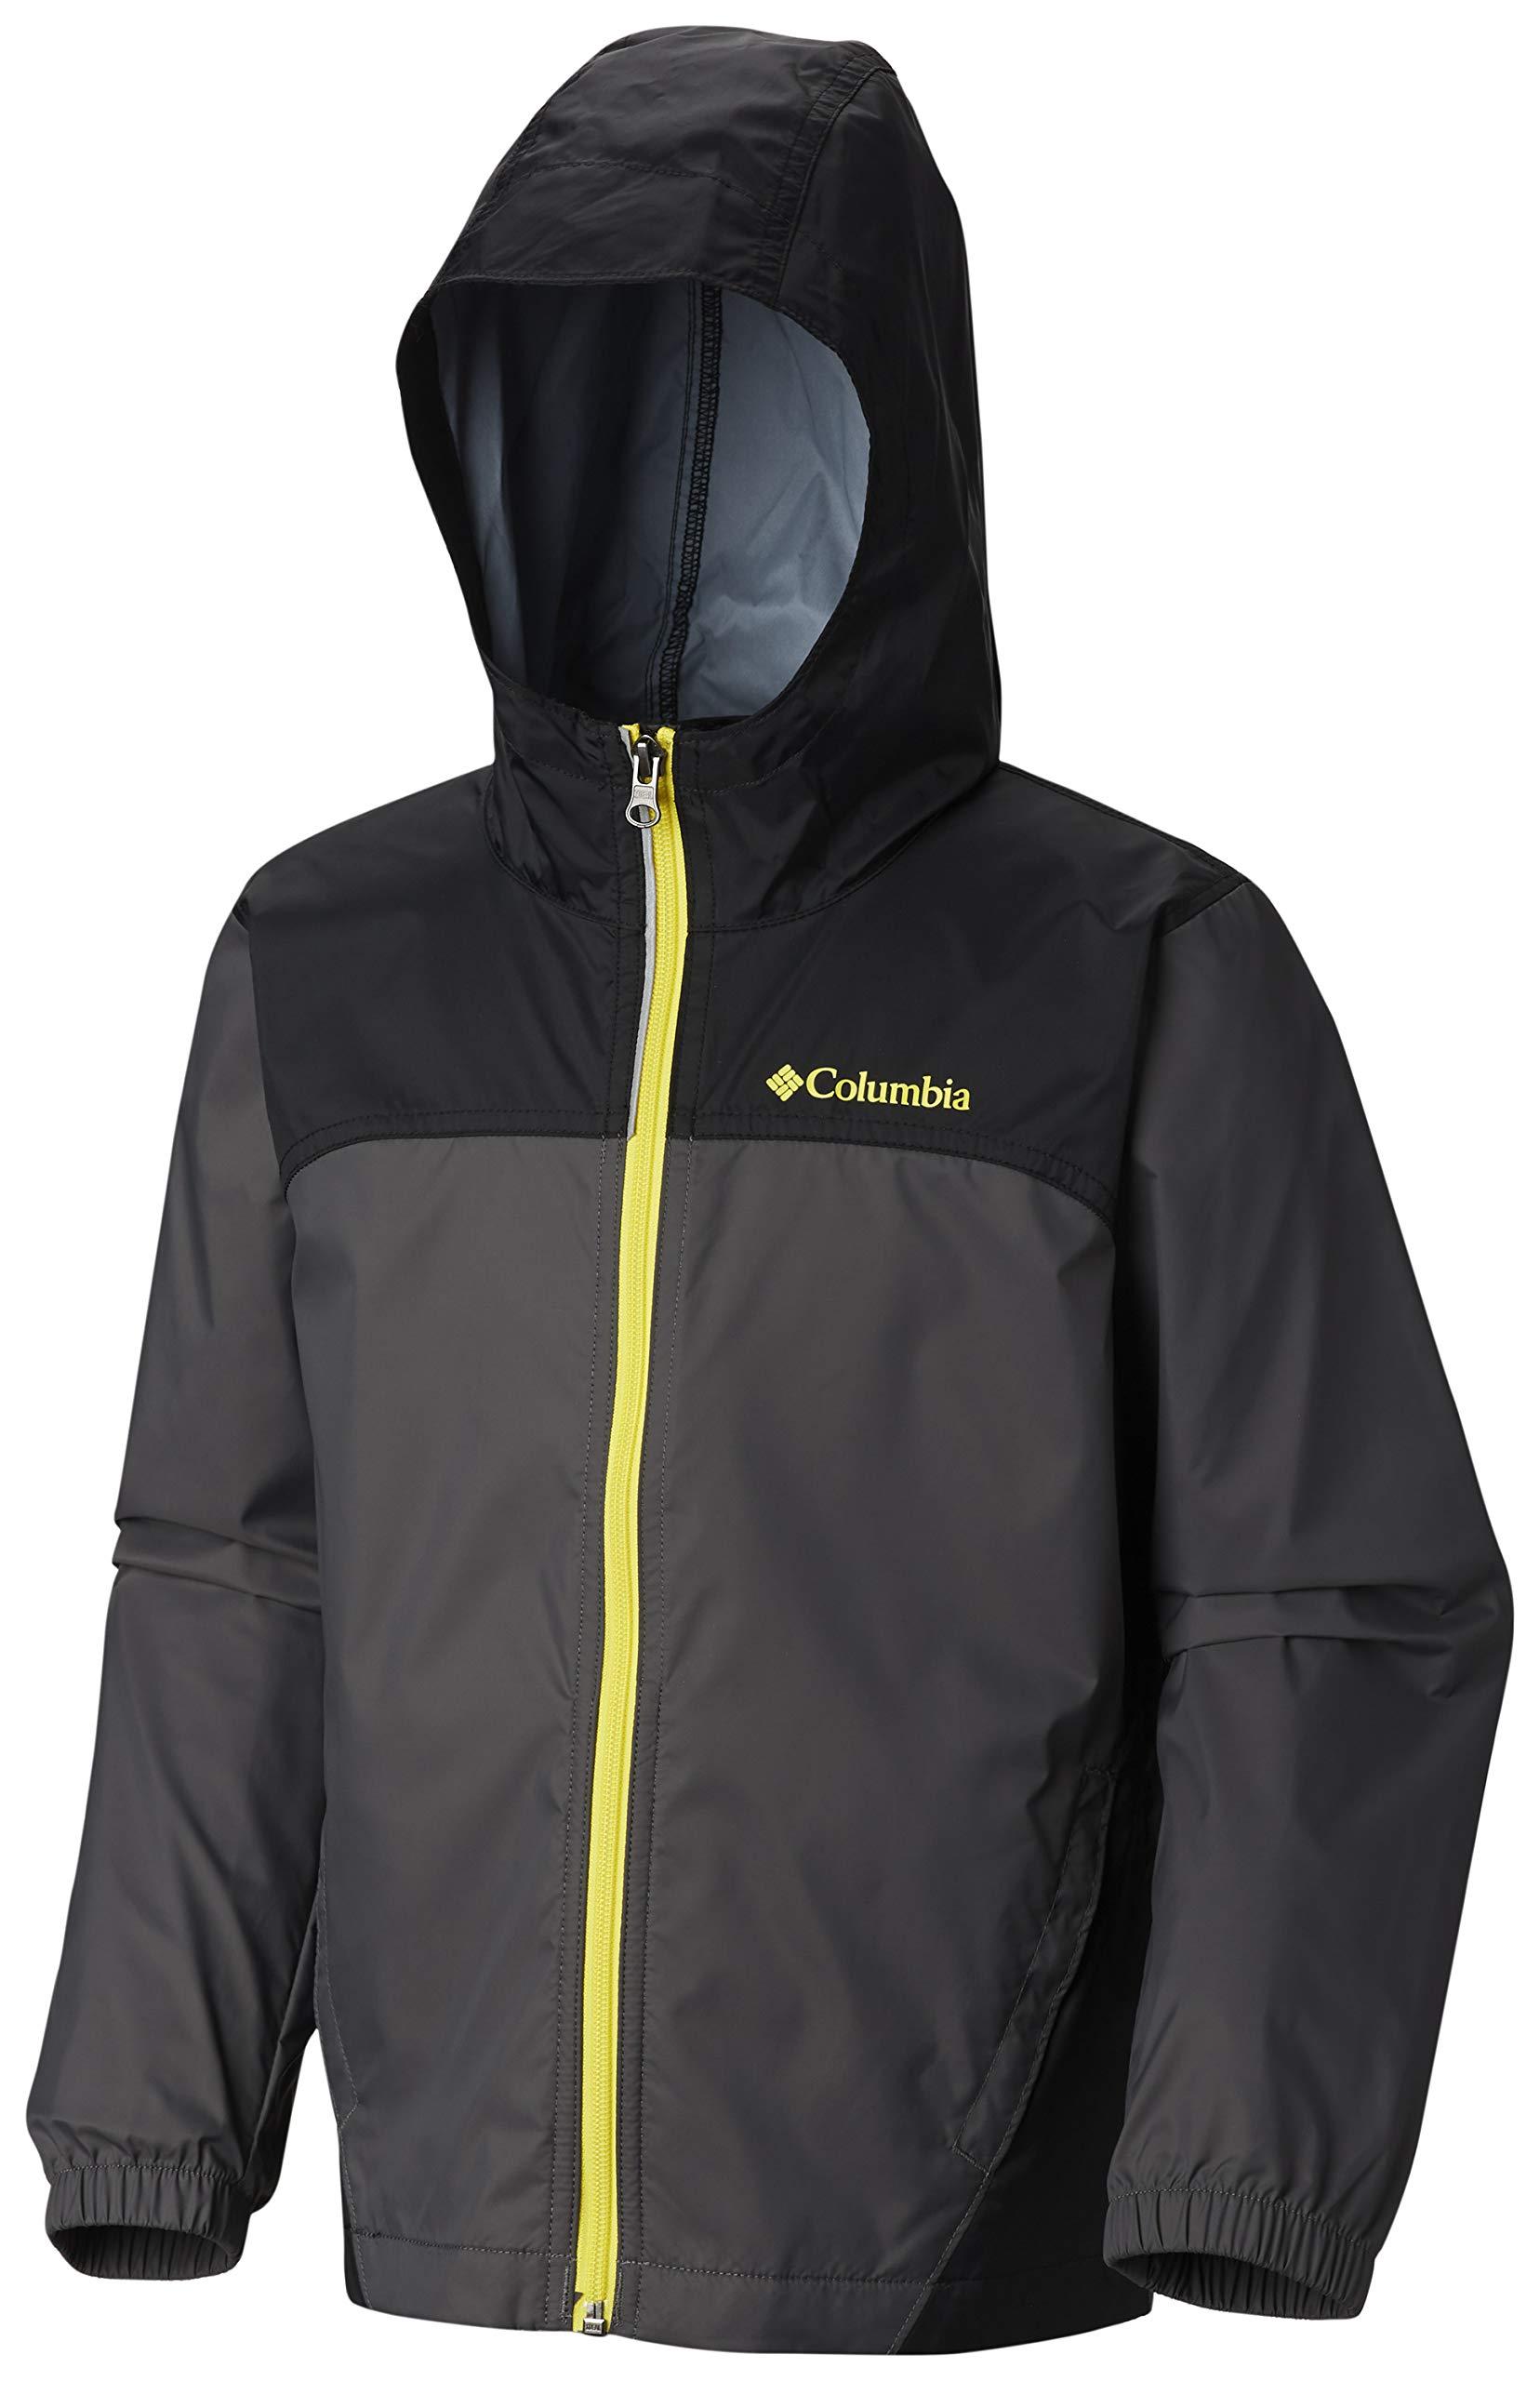 Columbia Boys' Little Glennaker Rain Jacket, Grill/Black X-Small by Columbia (Image #3)